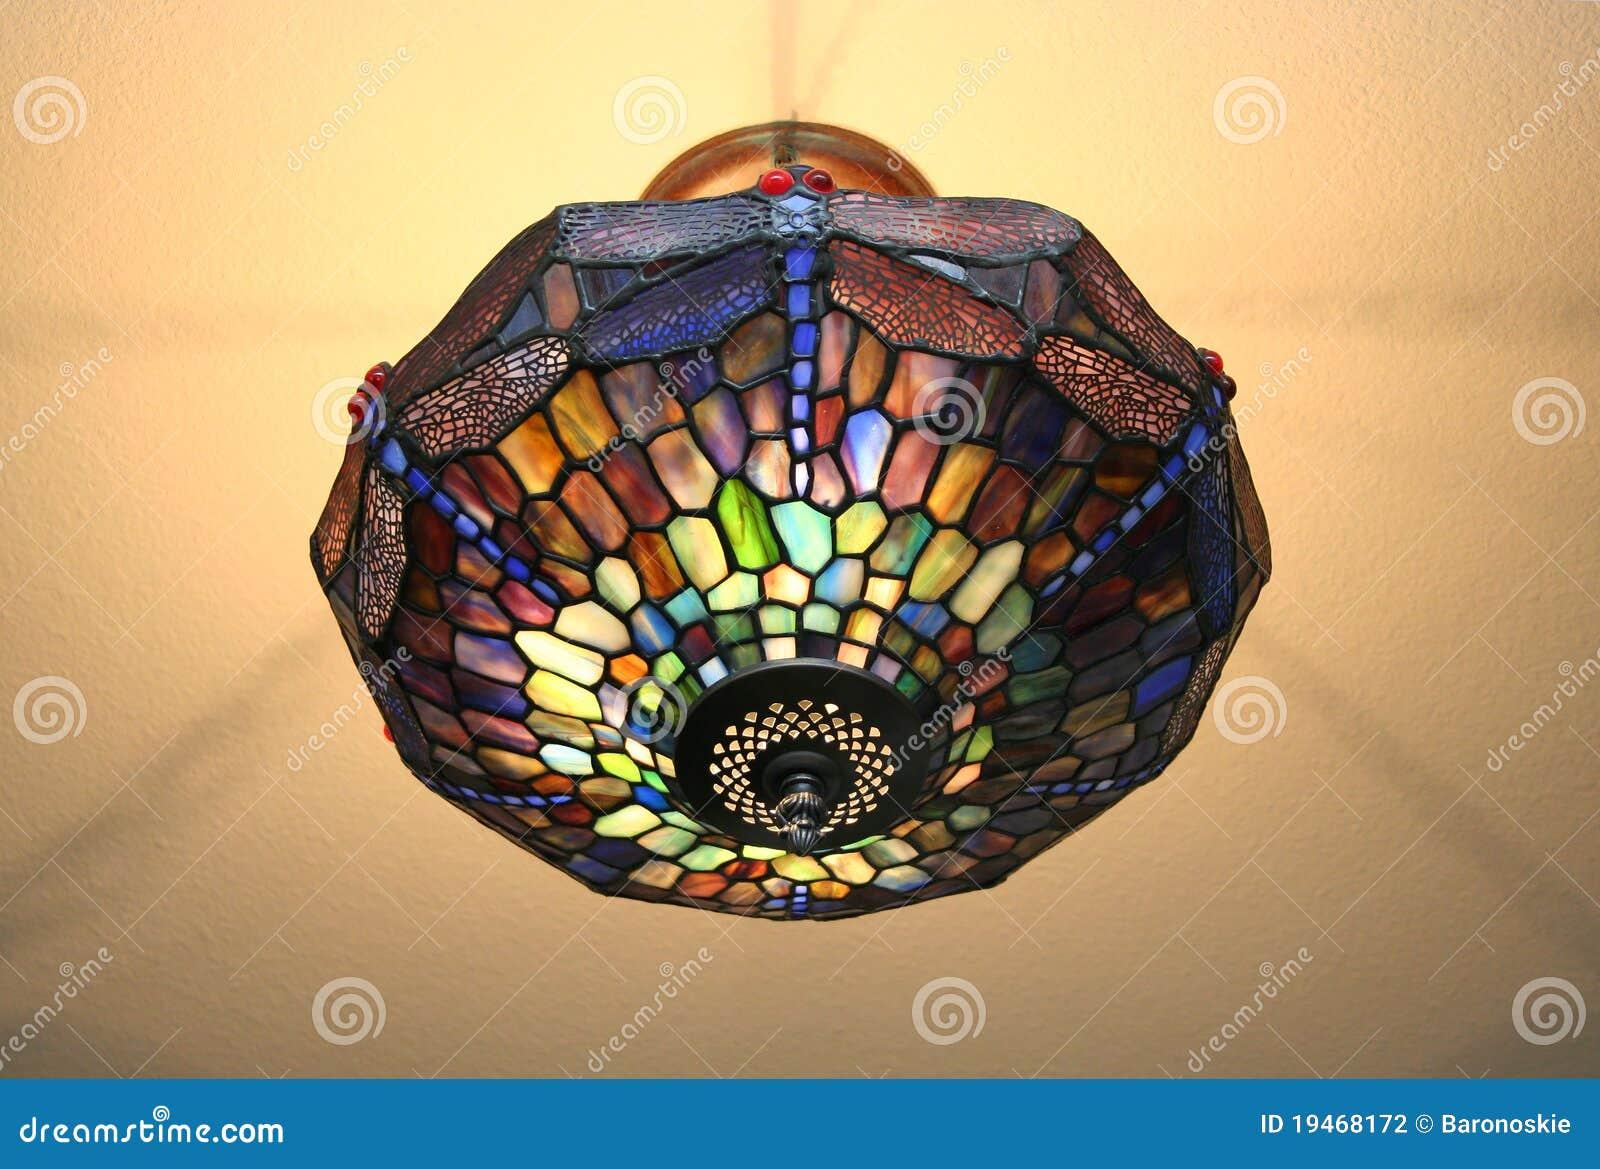 colored glass lighting. Colored Glass Lighting. Stained Light Lighting T Y